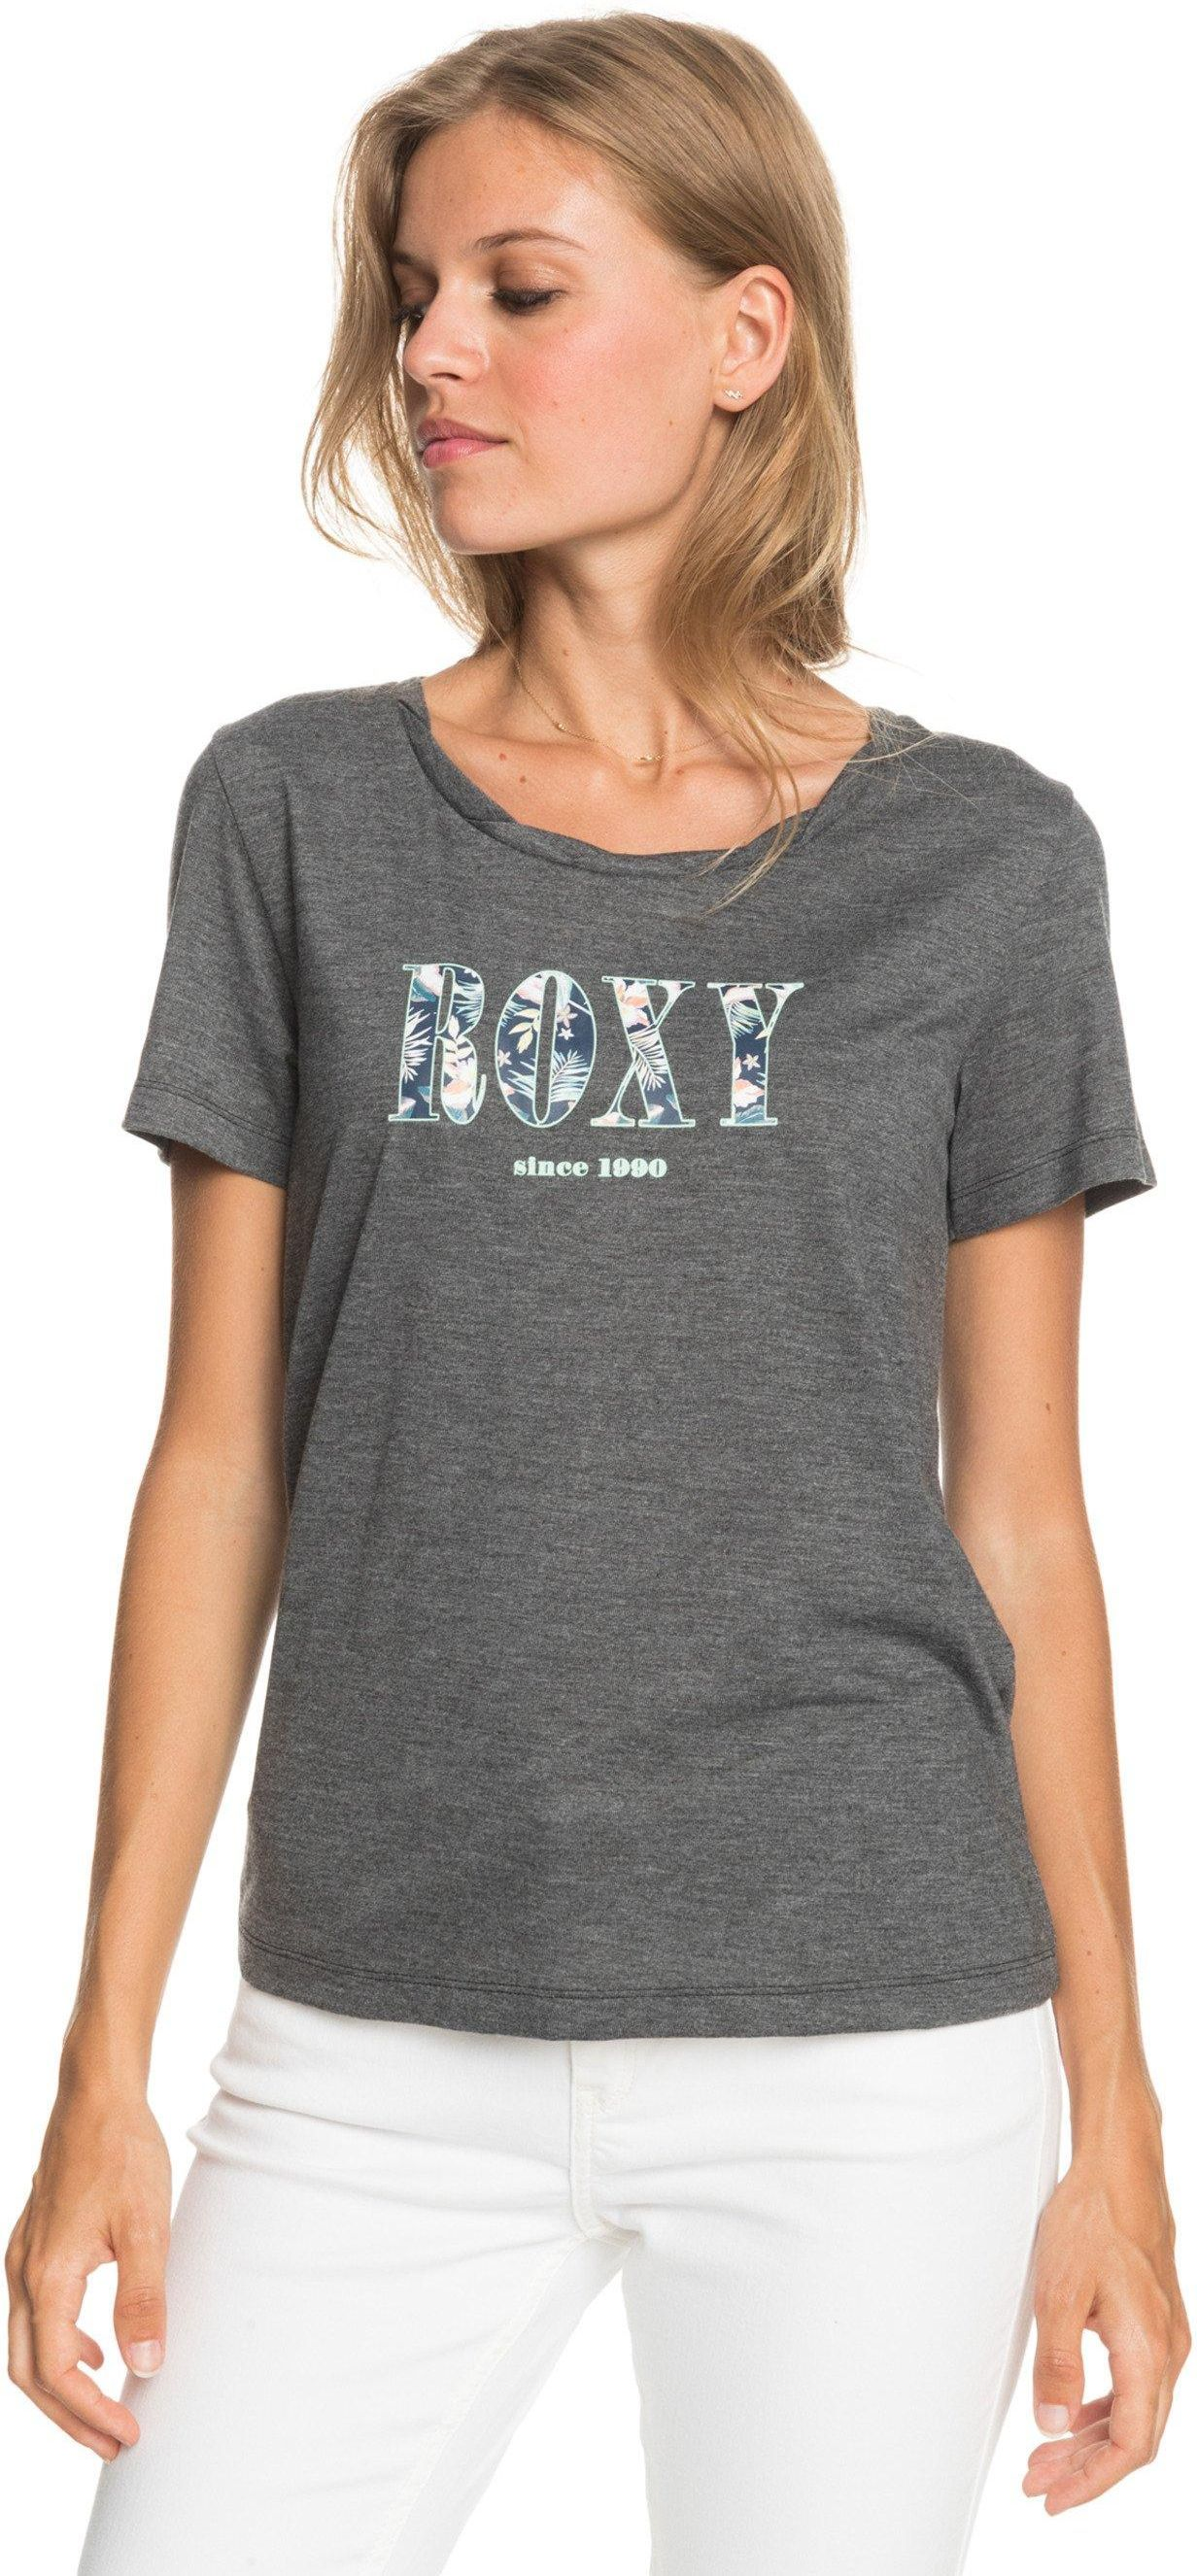 t-shirt damski ROXY CHASING THE SWELL B TEE Anthracite - KVJ0